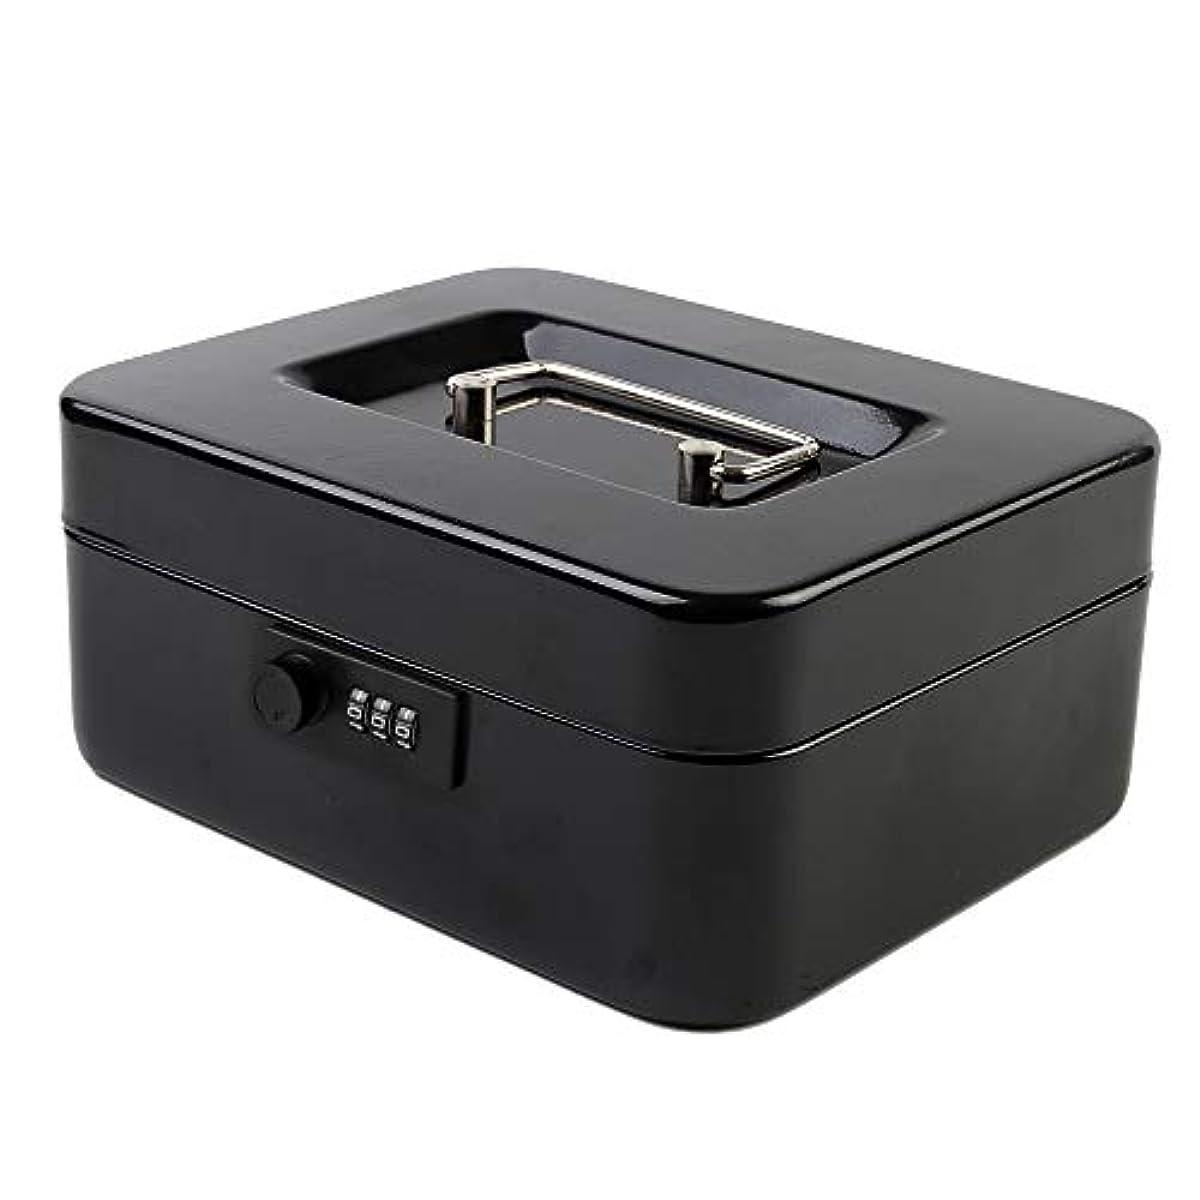 Metal Cash Box Security Safe Combination Lock Case Small Gun Jewelry Money Black